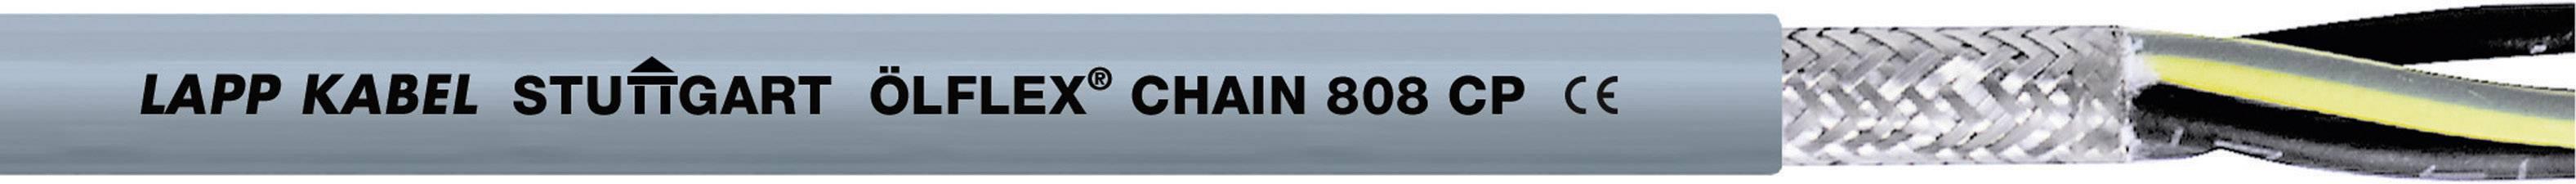 Žíla kabelu LappKabel ÖLFLEX CHAIN 808 CP 12G1,0 (1027772), 12x 1 mm², polyurethan, Ø 11,7 mm, stíněný, 50 m,